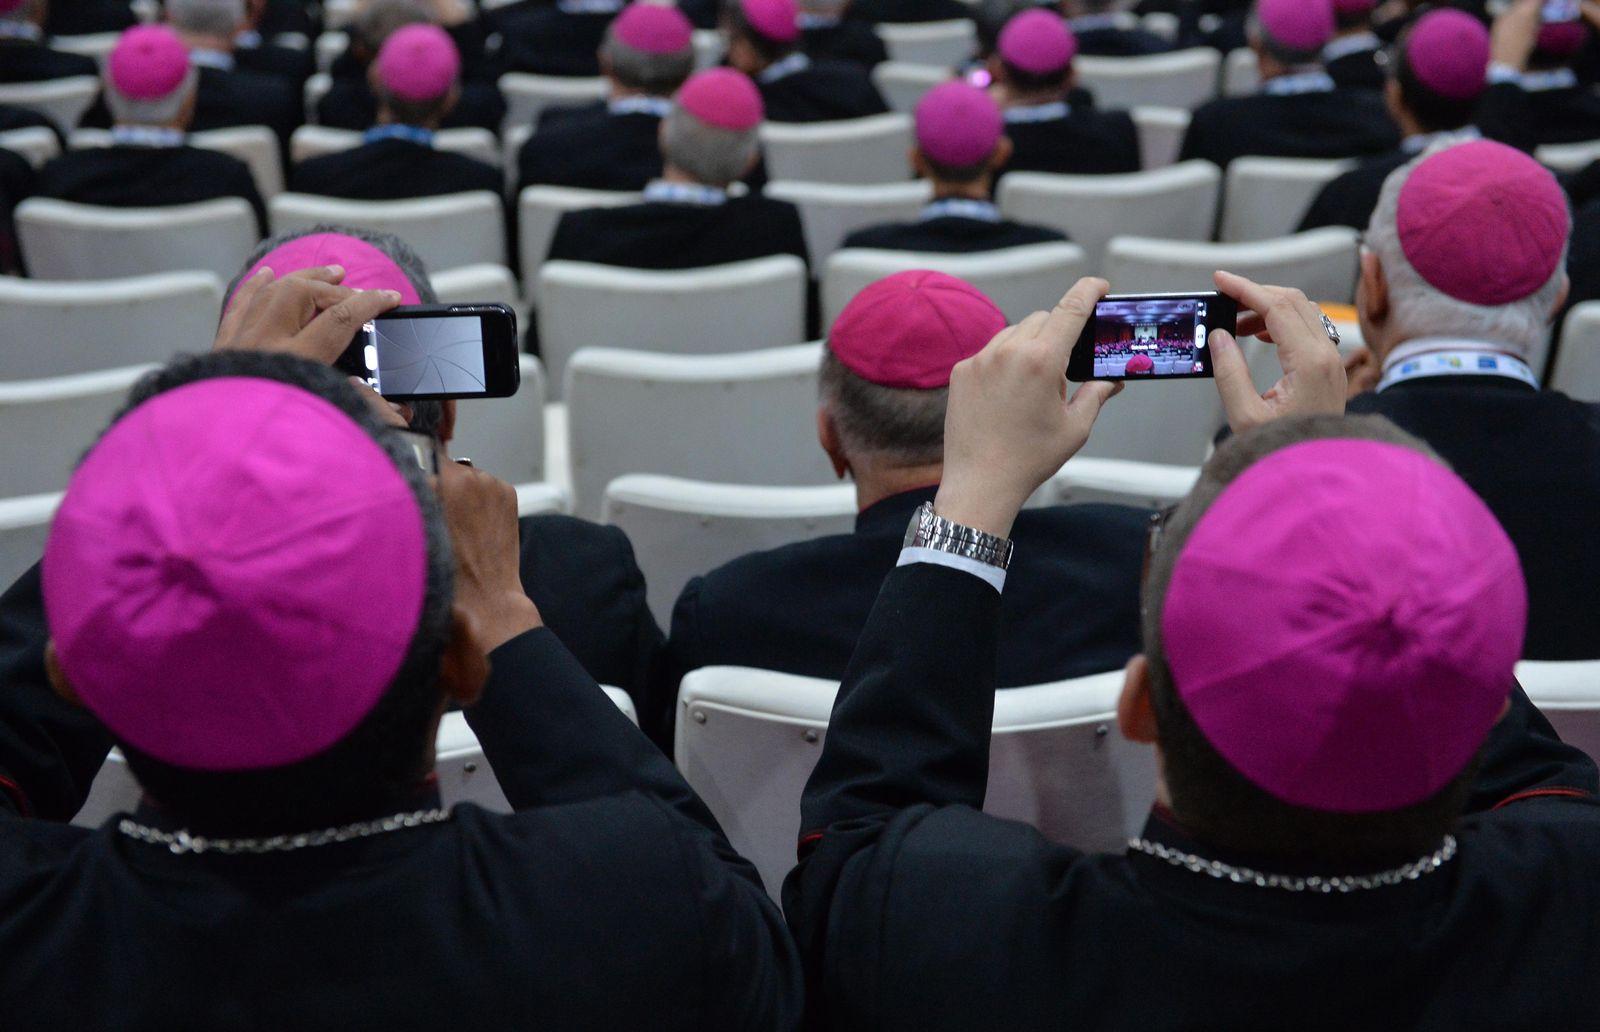 Bischöfe / Handy